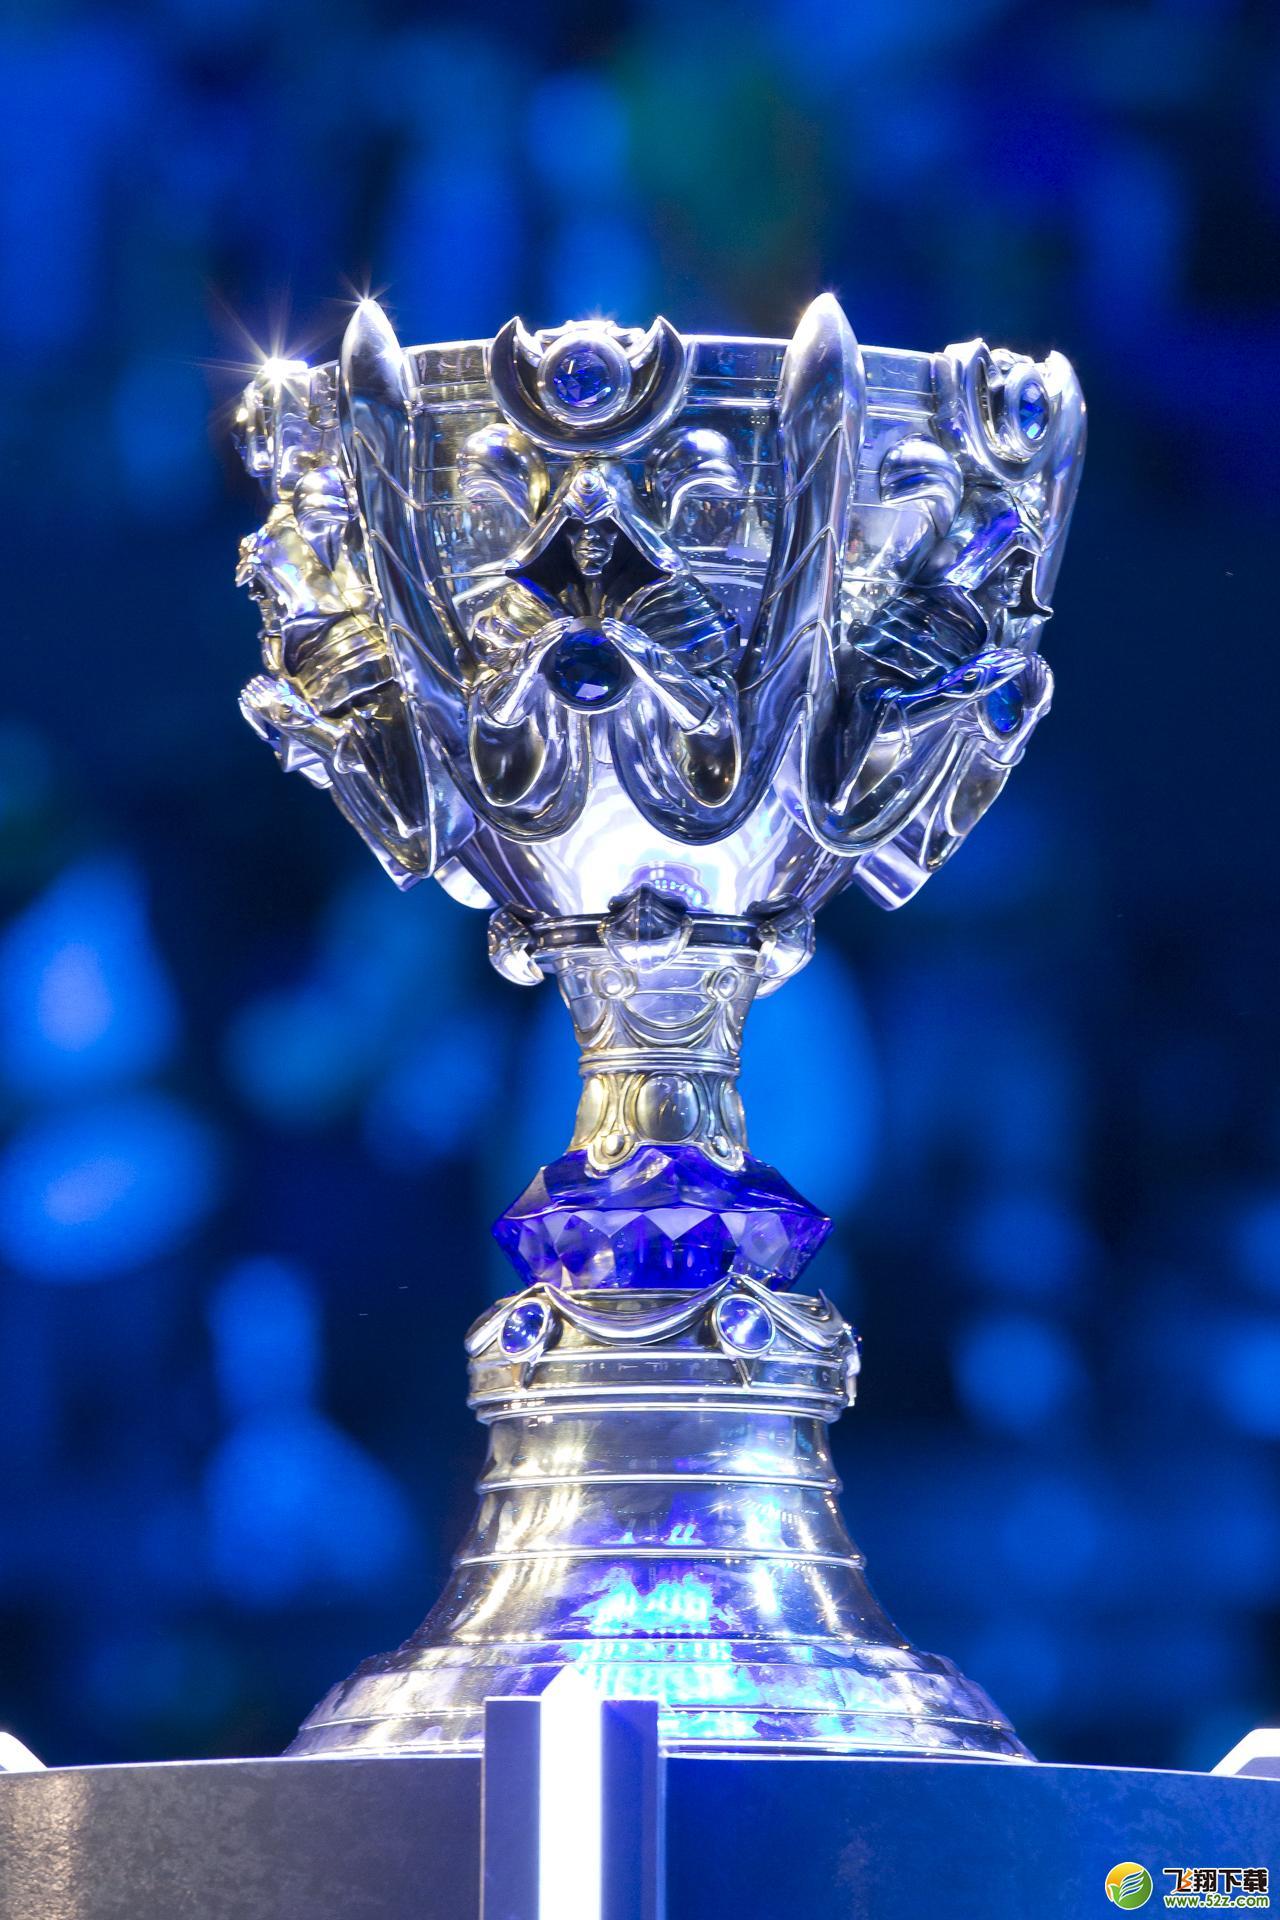 lol2014赛季世界总决赛直播地址 英雄联盟2014赛季世界总决赛公告 飞